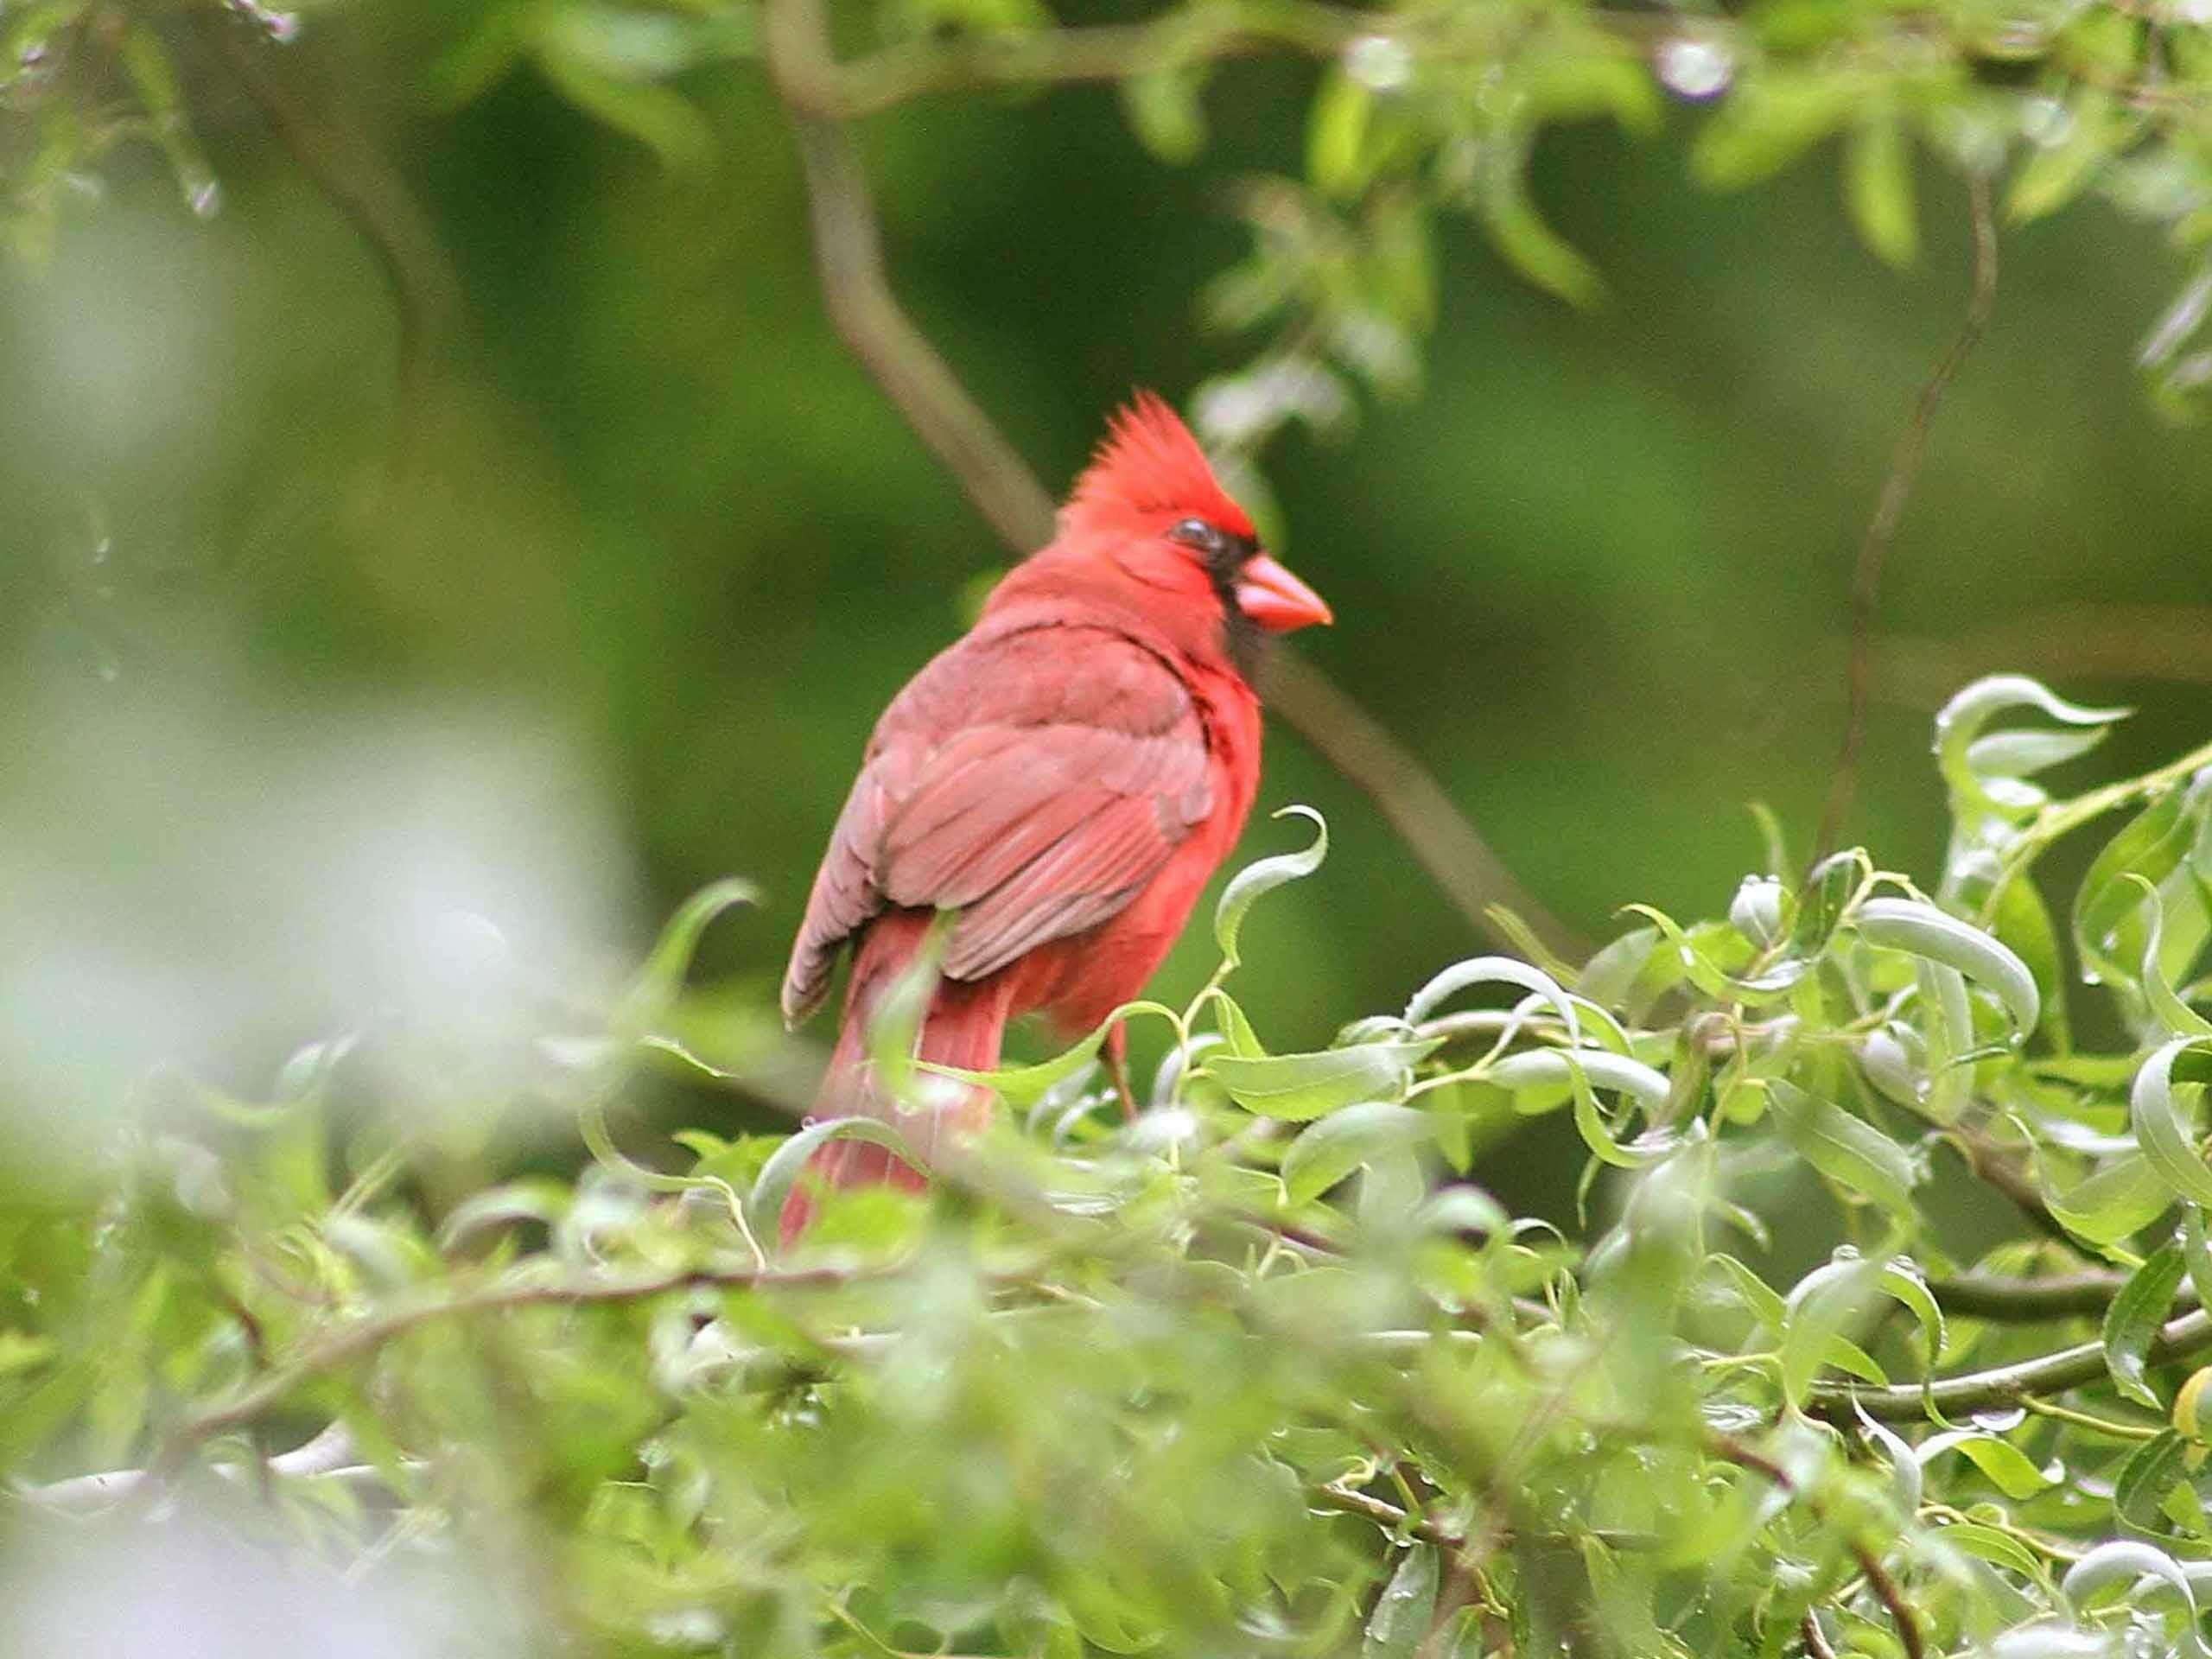 Res: 2560x1920, red bird wallpaper #437882